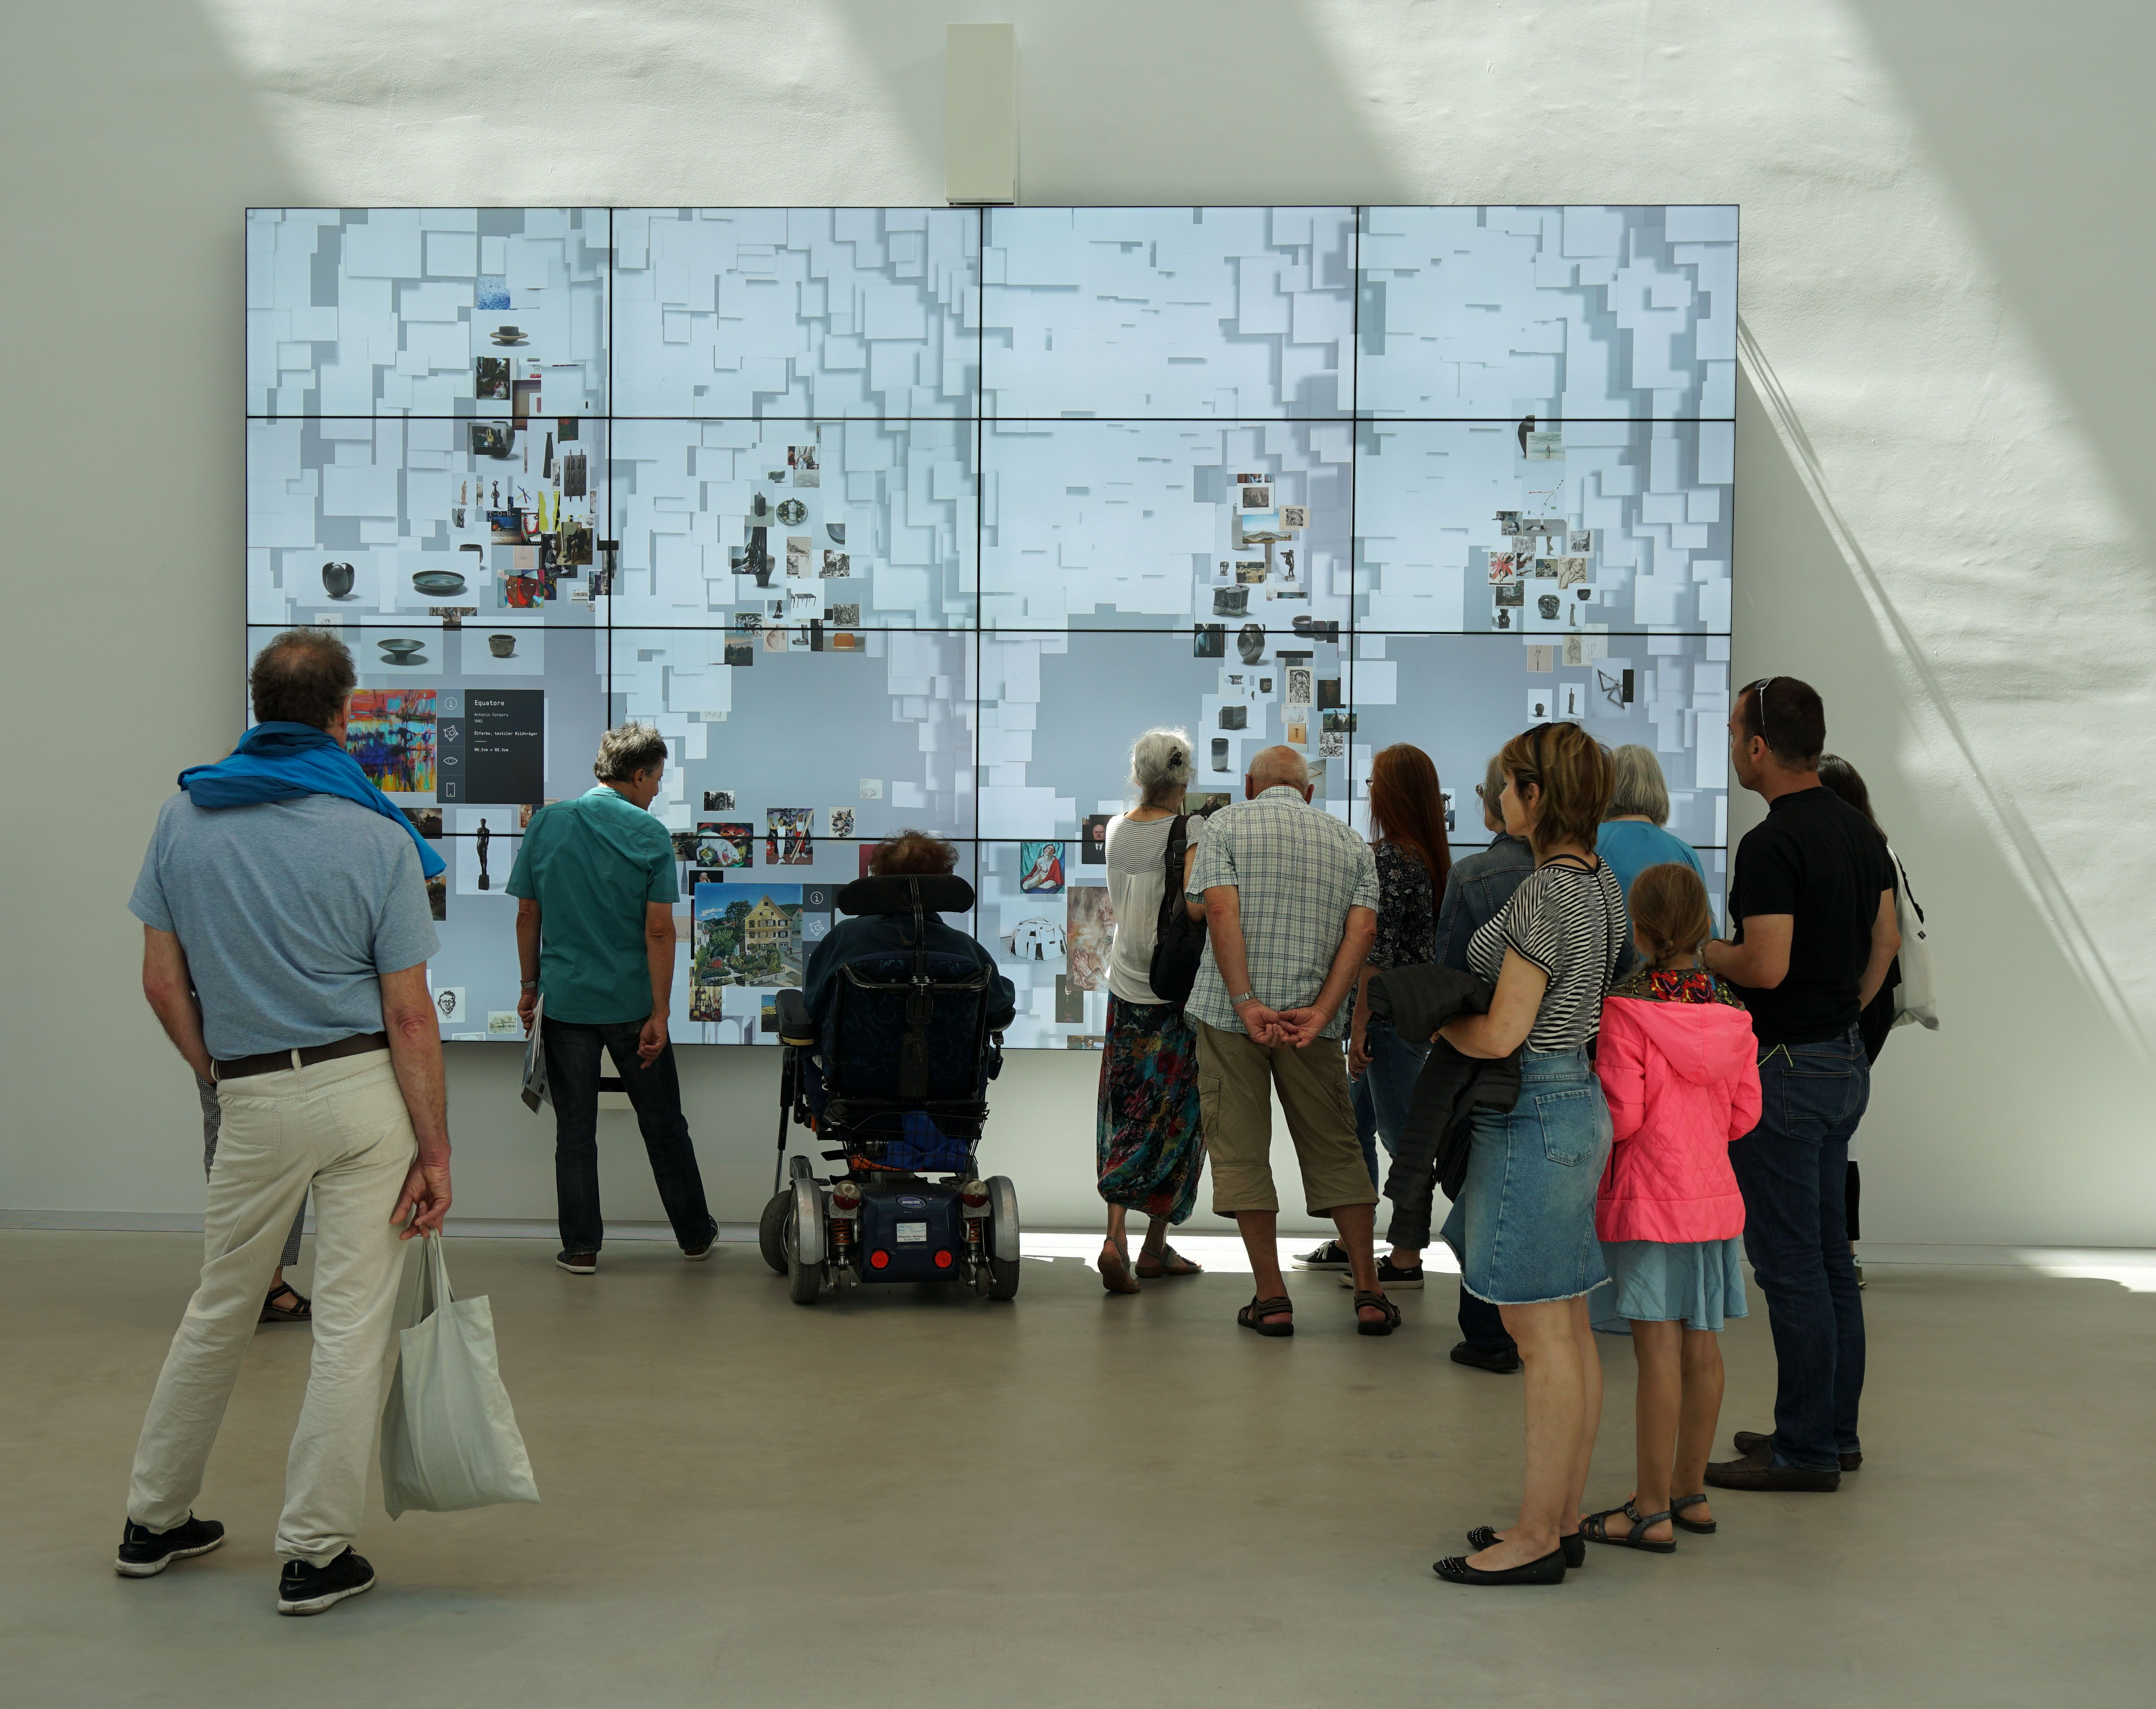 Collection_Wall_Kunsthalle_Mannheim